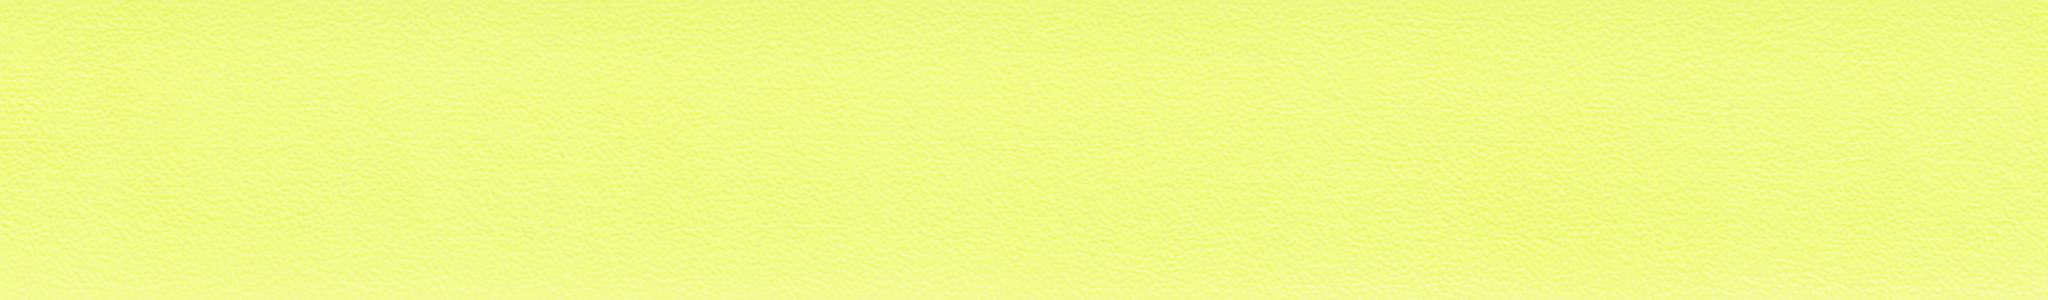 HU 167104 кромка ABS зеленая жемчуг 101